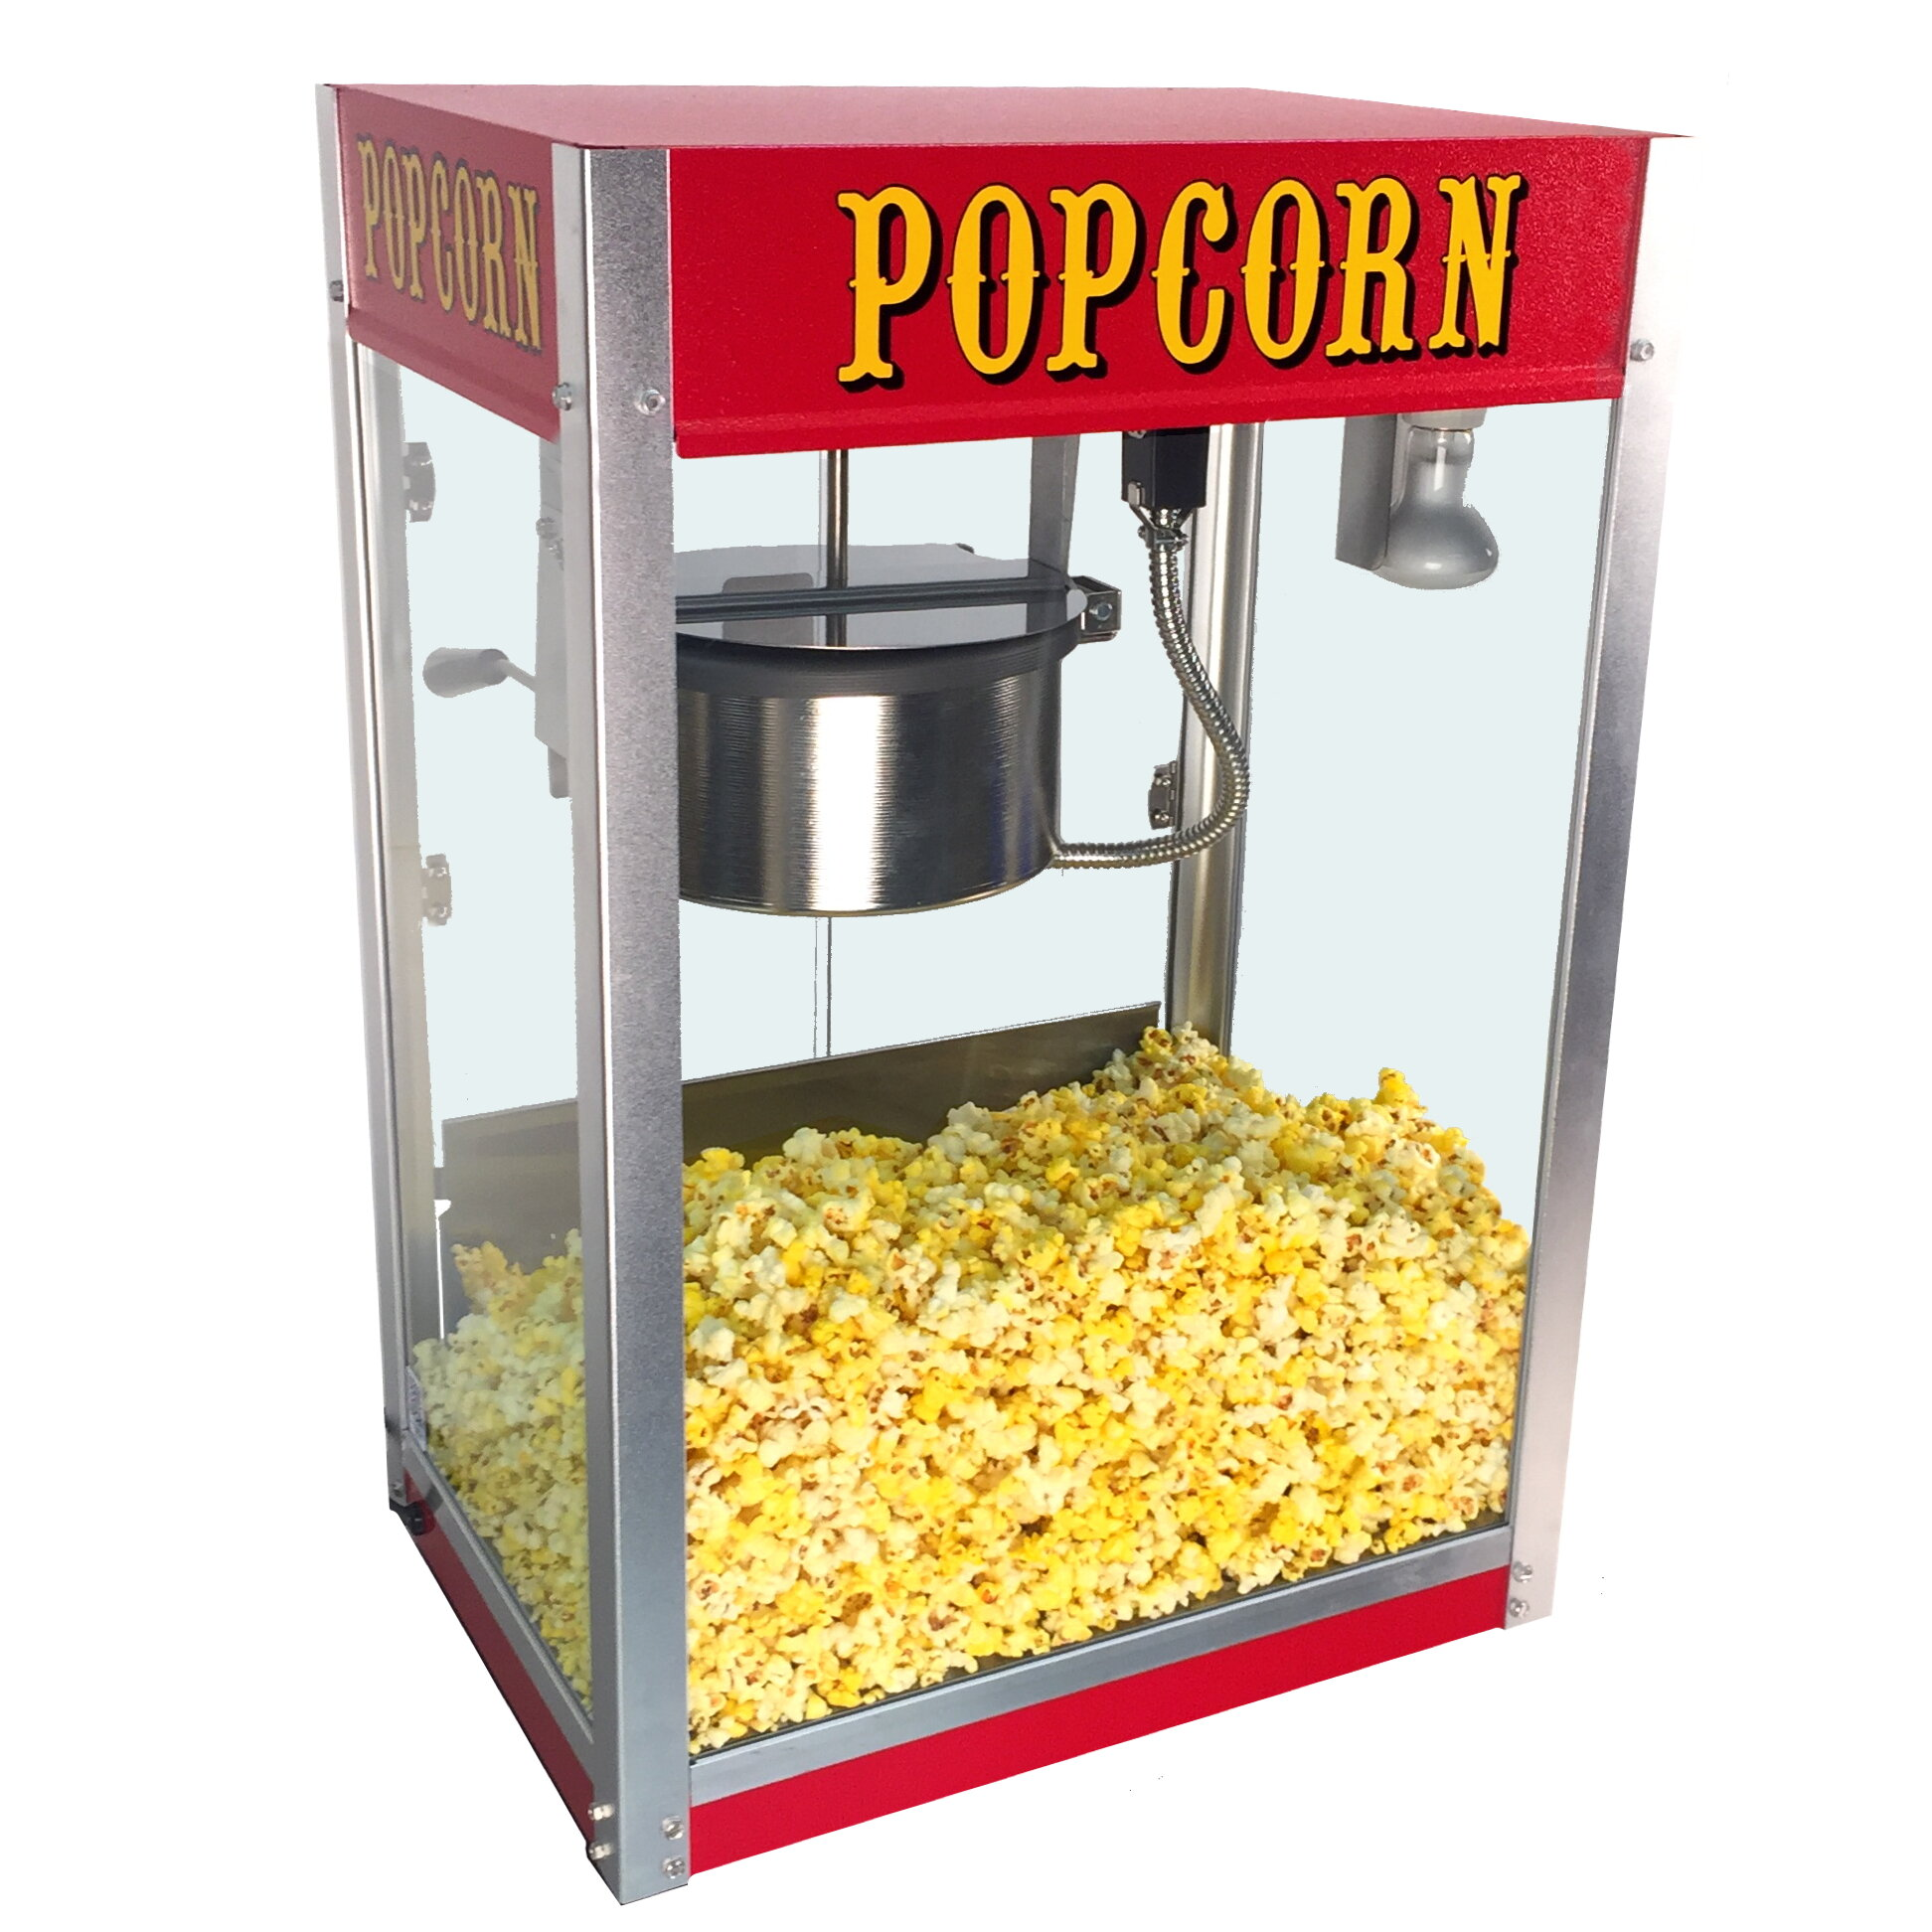 Paragon International Theater Pop 8 oz. Popcorn Machine | Wayfair